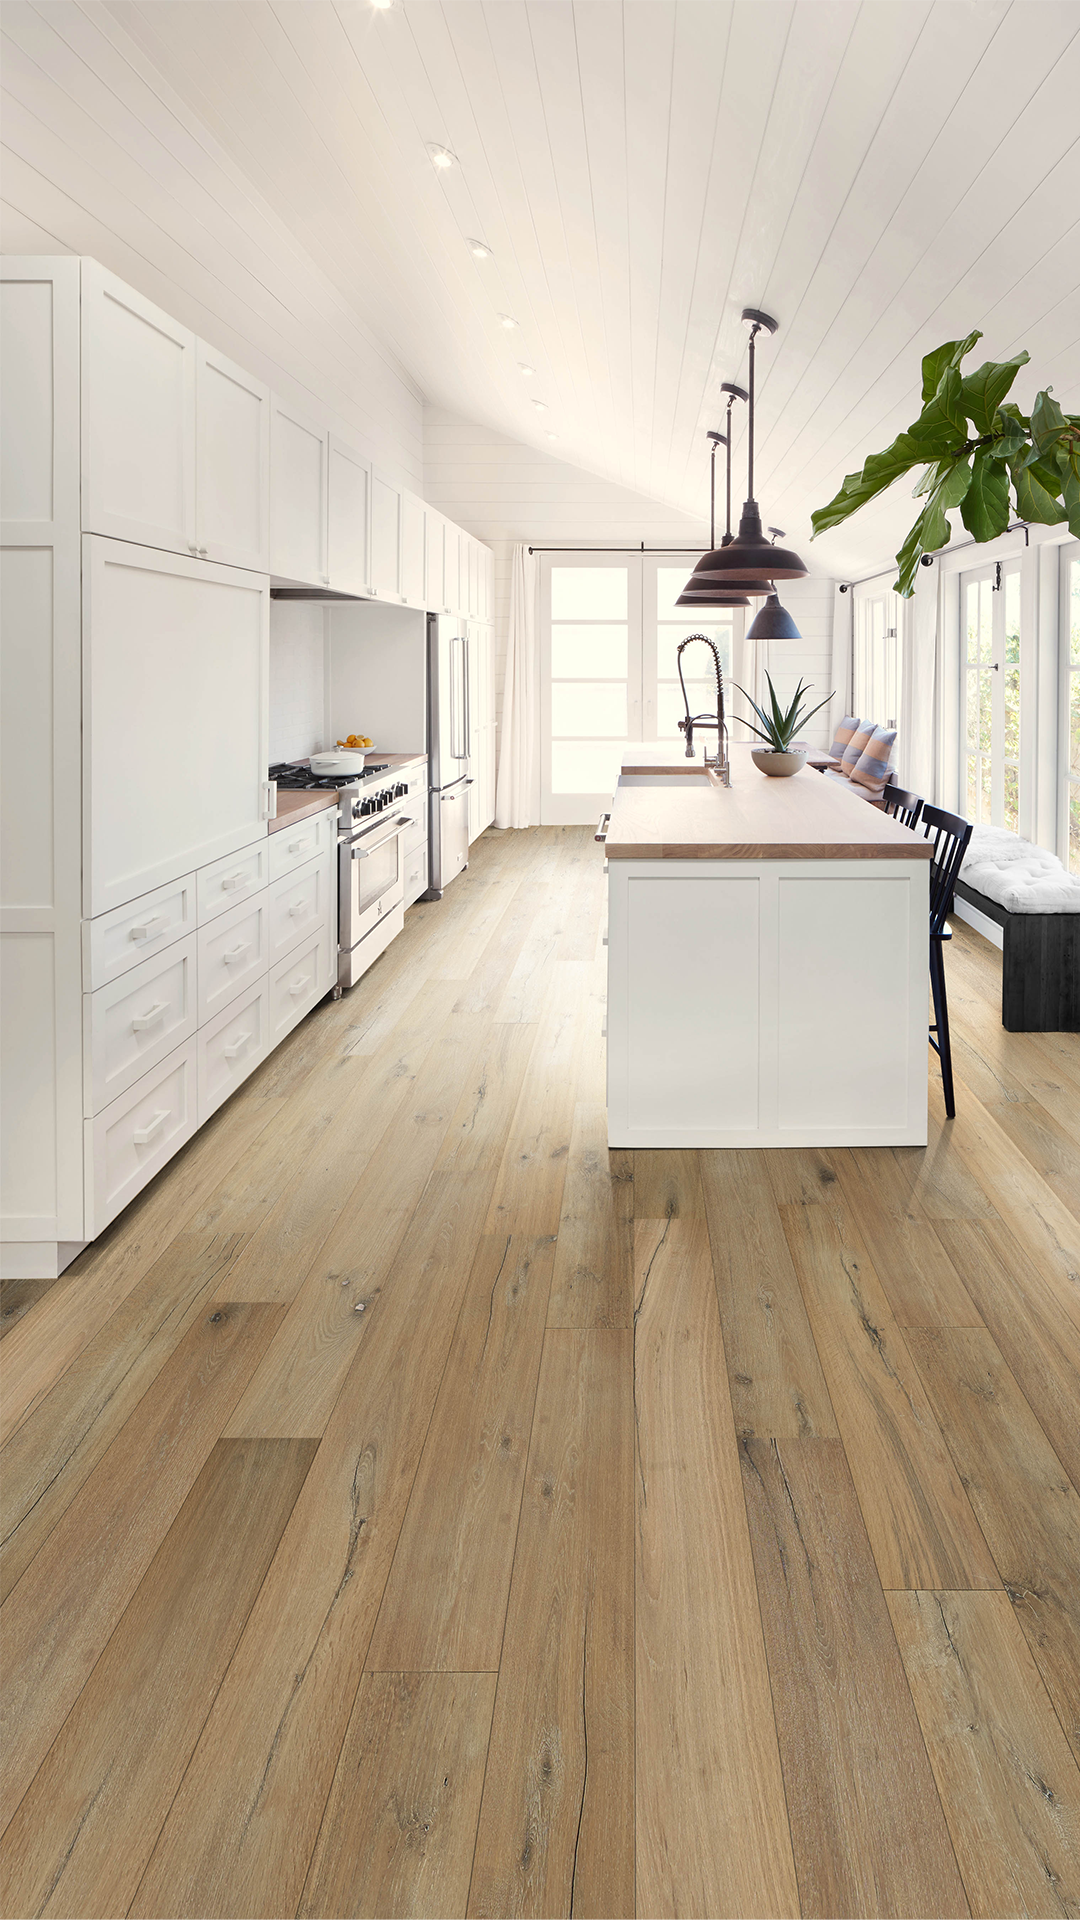 Rustic Is In With This Kitchen Anew Oak Gentling Engineered Hardwood Flooring Contrasts Perfectly W Hardwood Floors Dark Hardwood Floor Colors House Flooring